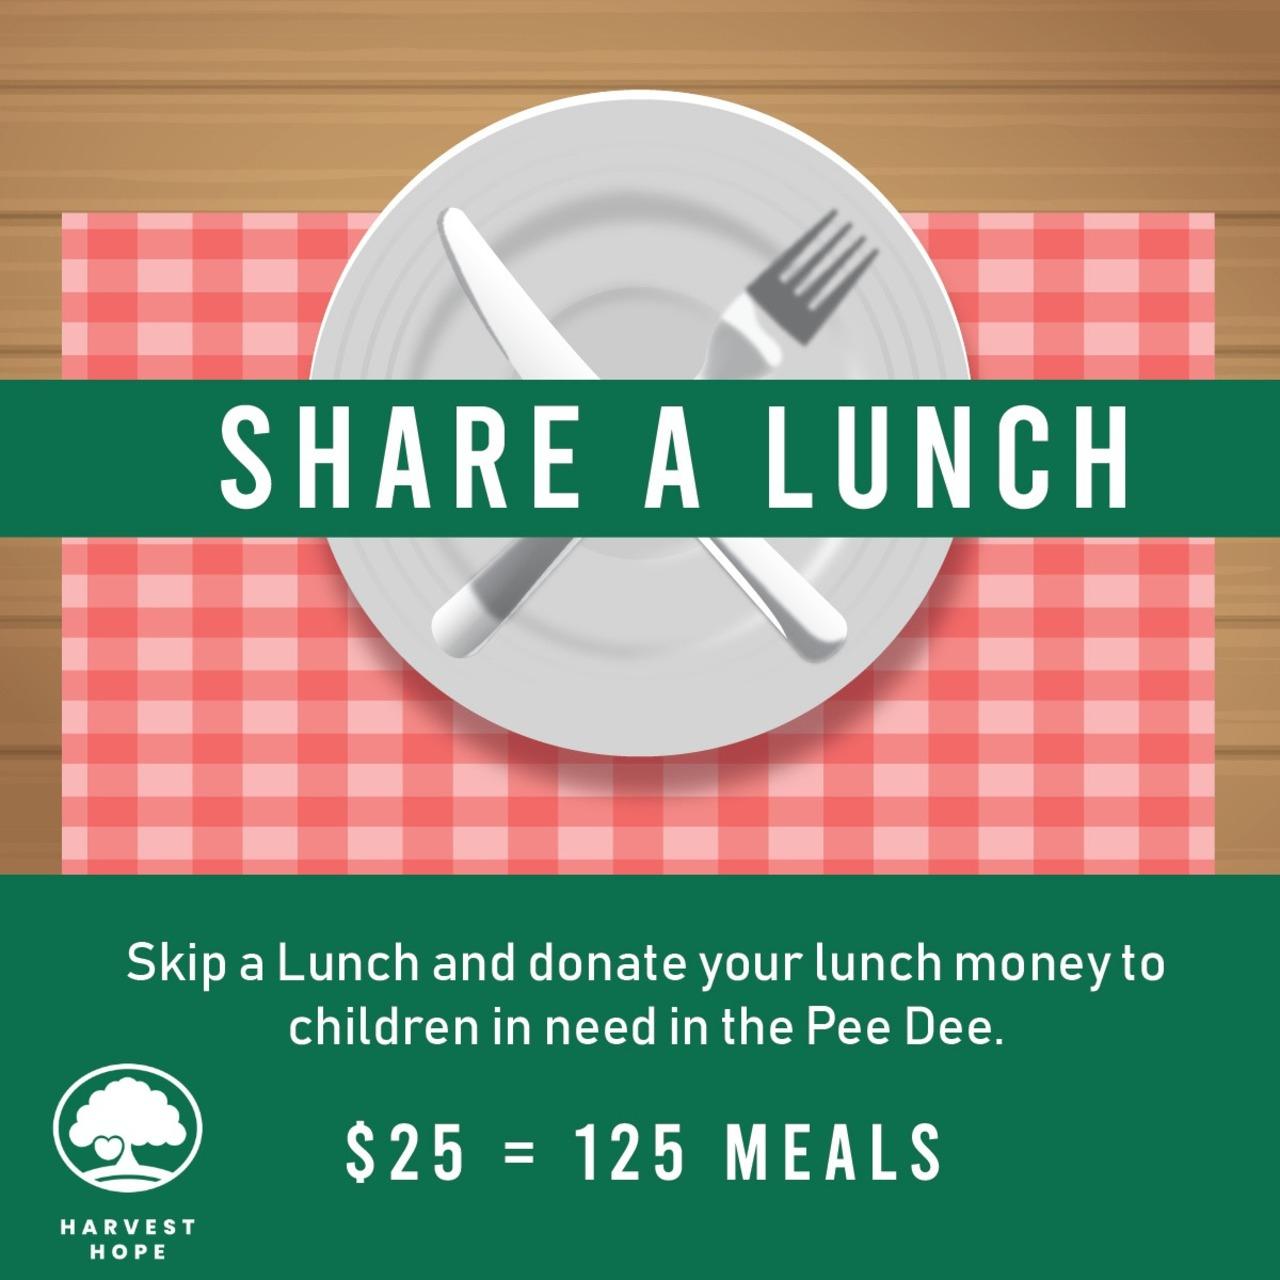 El'Jireth Penecostal Church's Share a Lunch Fundraiser for Harvest Hope